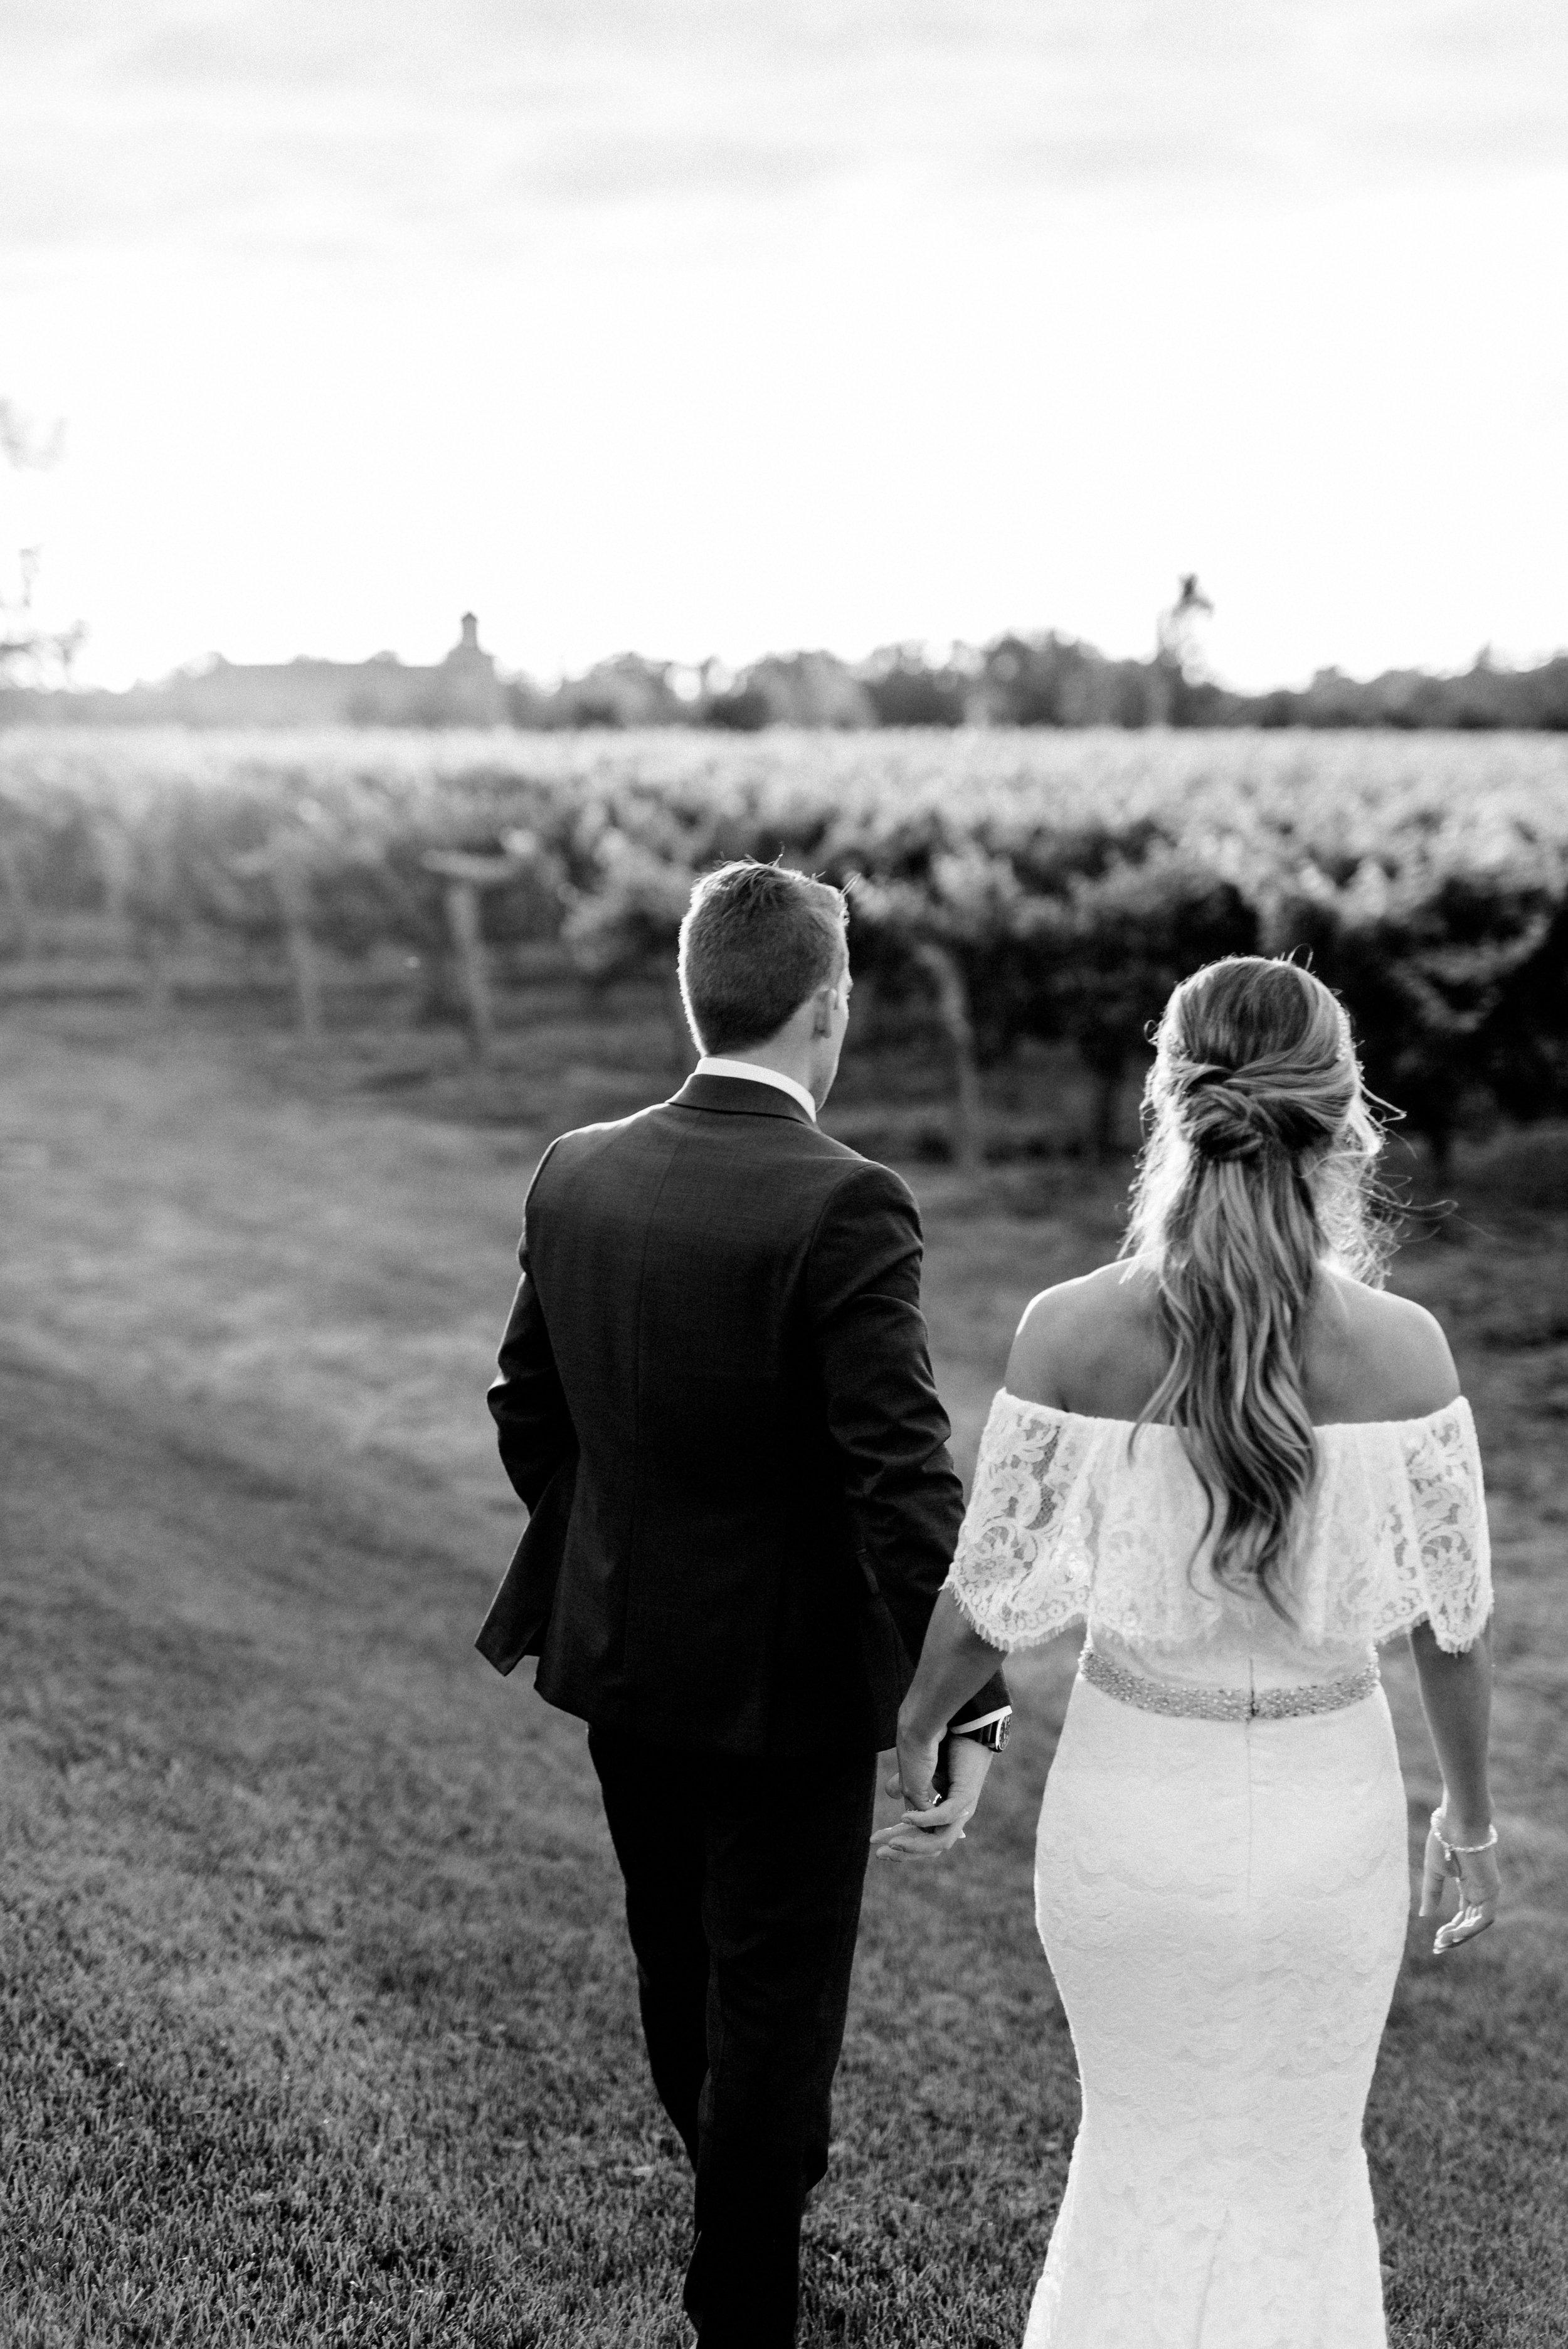 Jacqueline James Photography - Jacqueline James Photography is a boutique wedding photography service for the modern, wild romantics.Email: info@jacquelinejamesphoto.comContact:Jacqueline JamesPhone: (416)-271-9834Website: www.jacquelinejamesphoto.cominstagram ~  facebook ~  twitter ~  pinterest